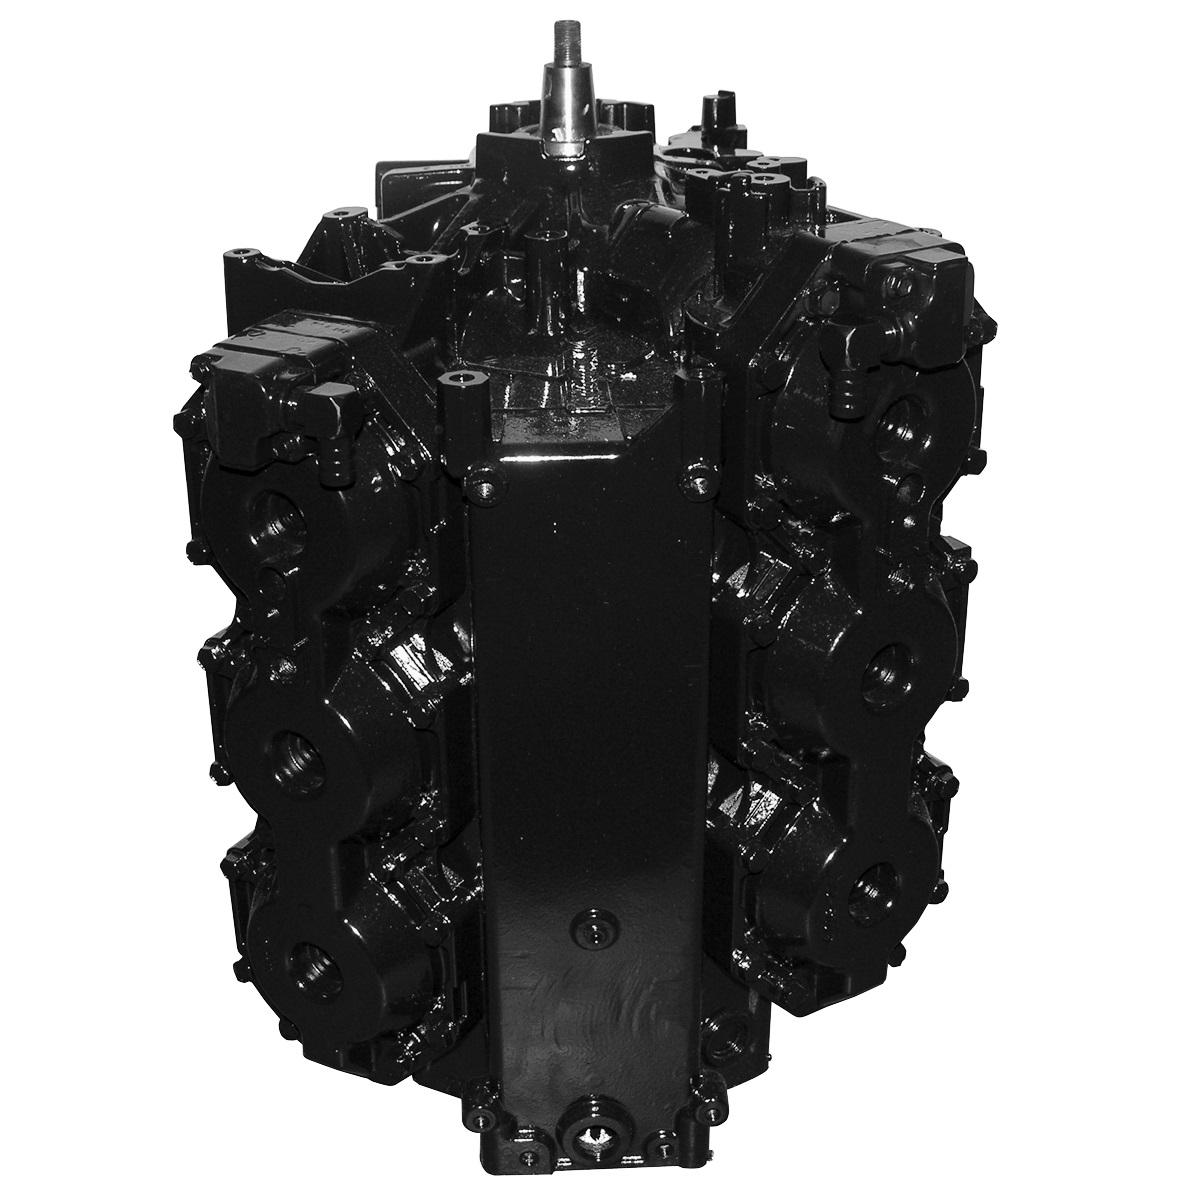 small resolution of category merc 6 cyl powerheads jpg